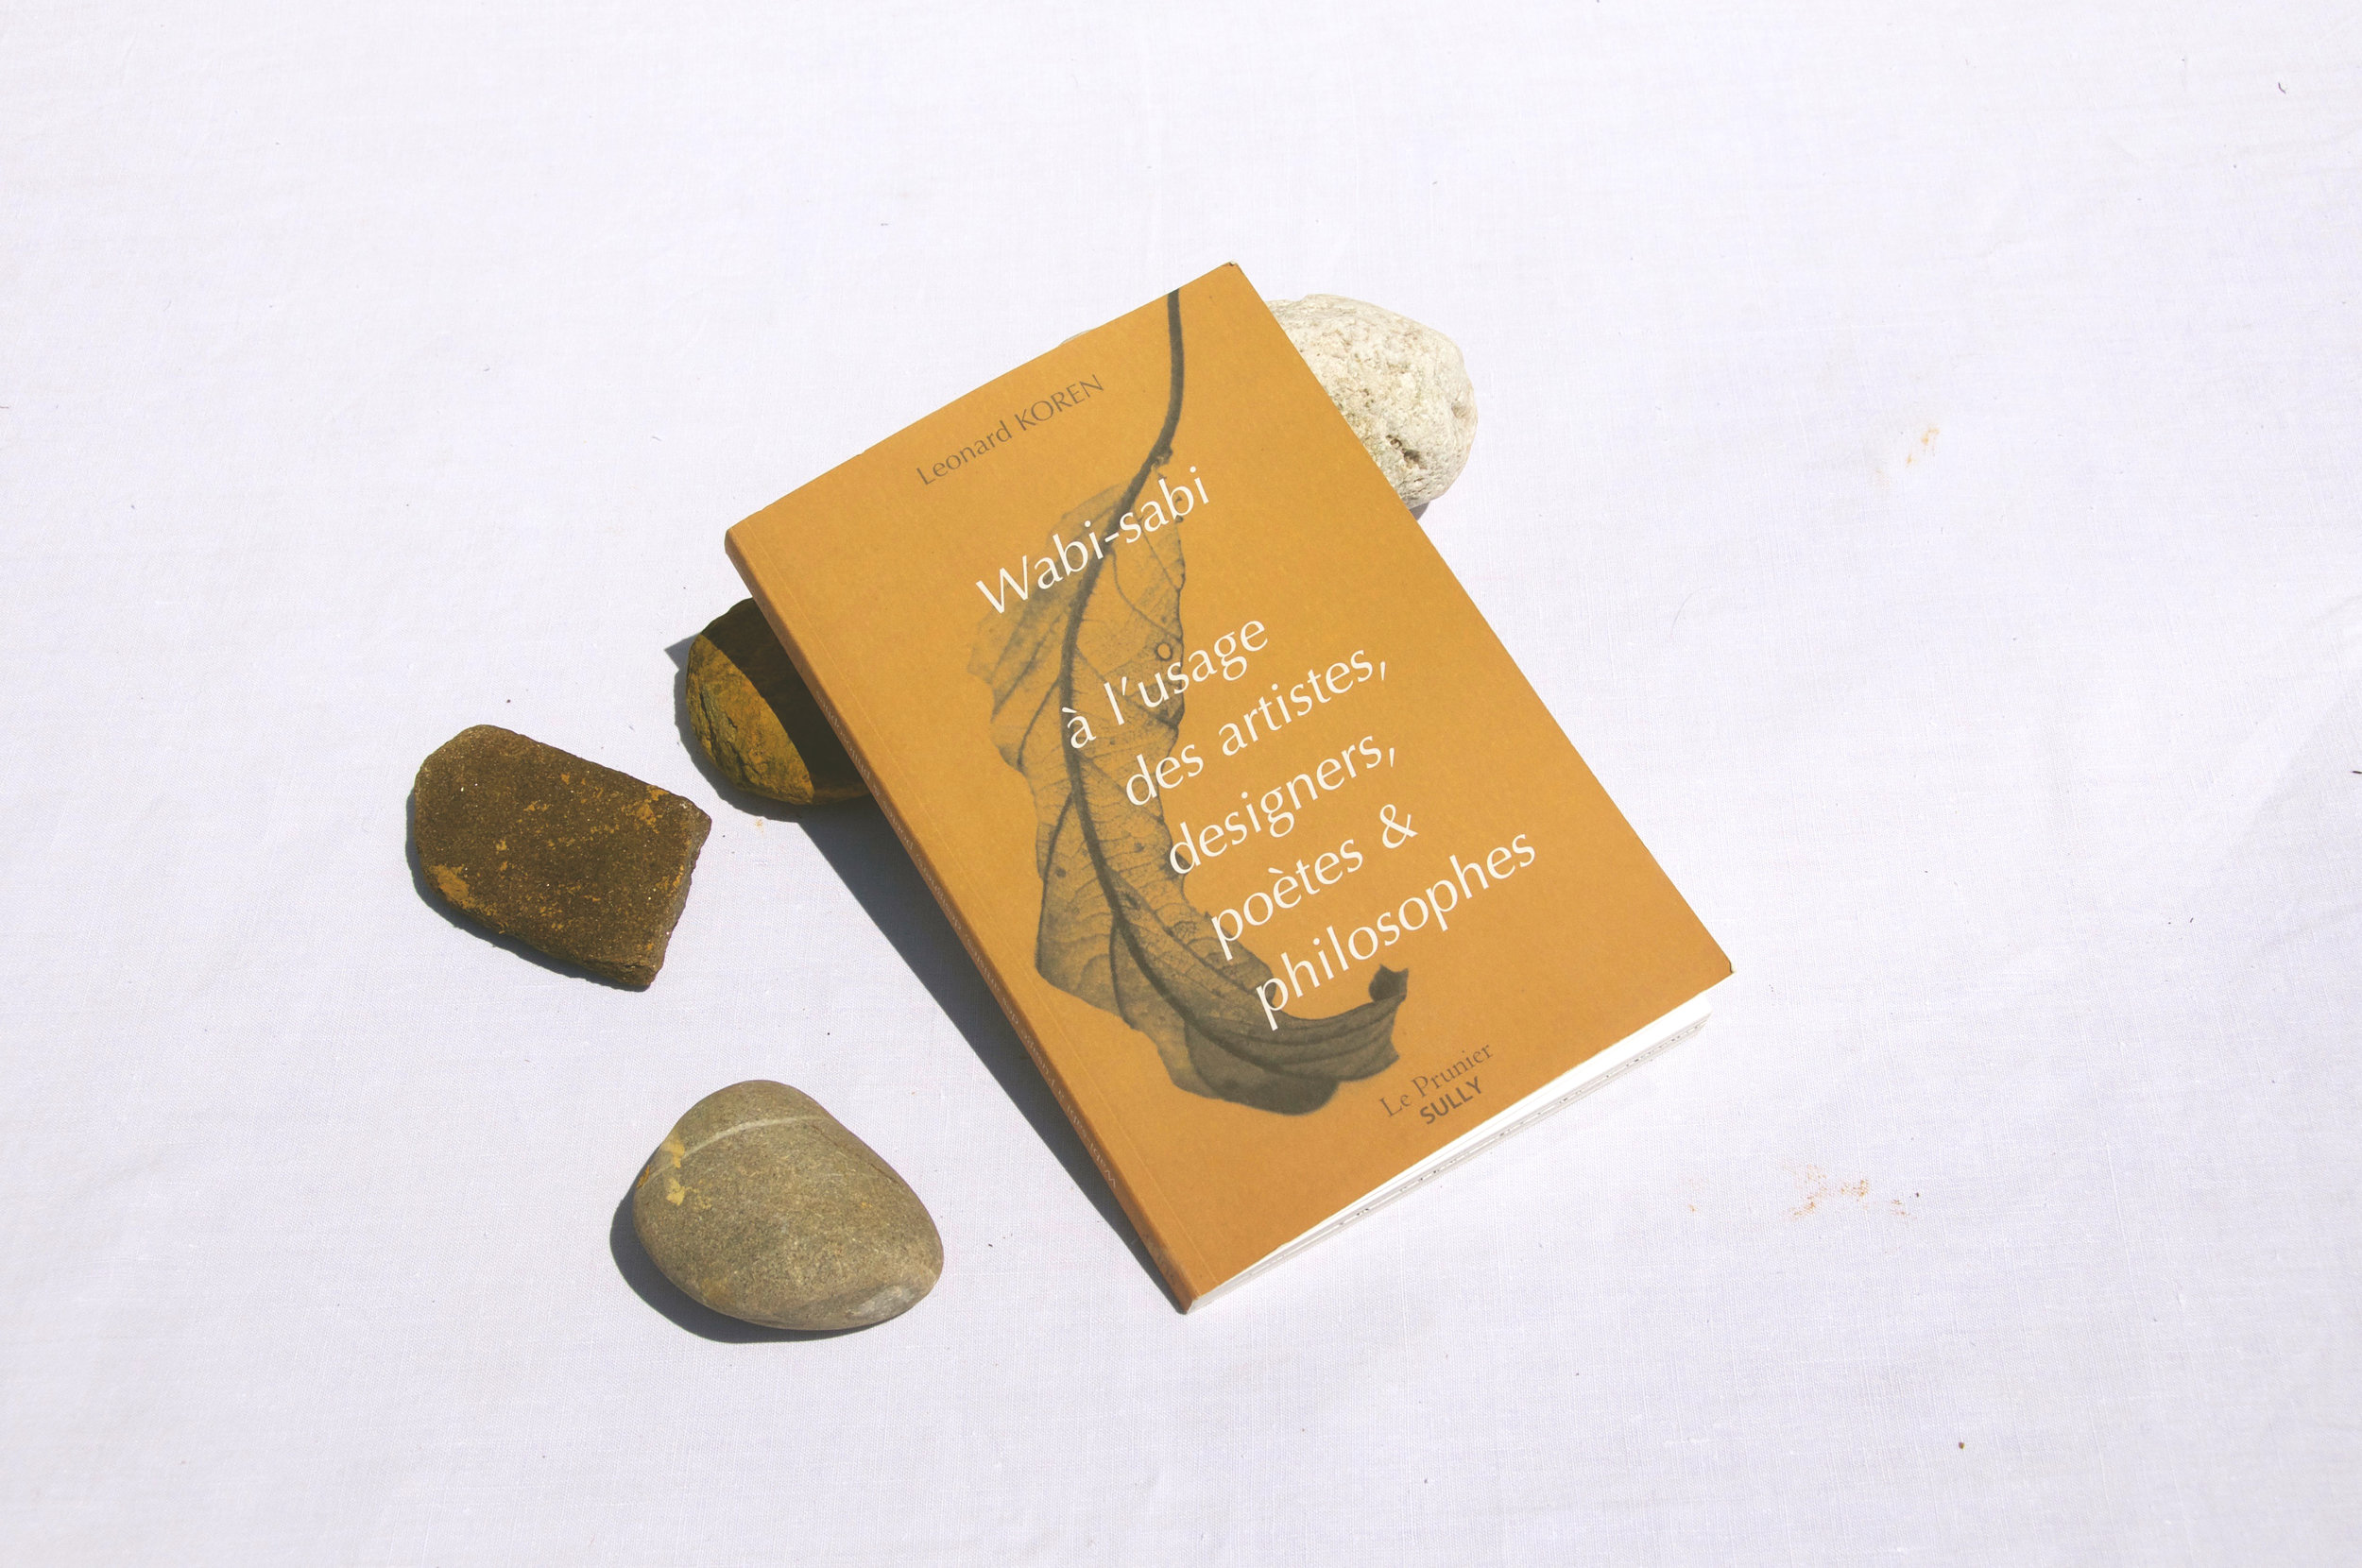 Livre de Leonard Koren sur le Wabi-sabi